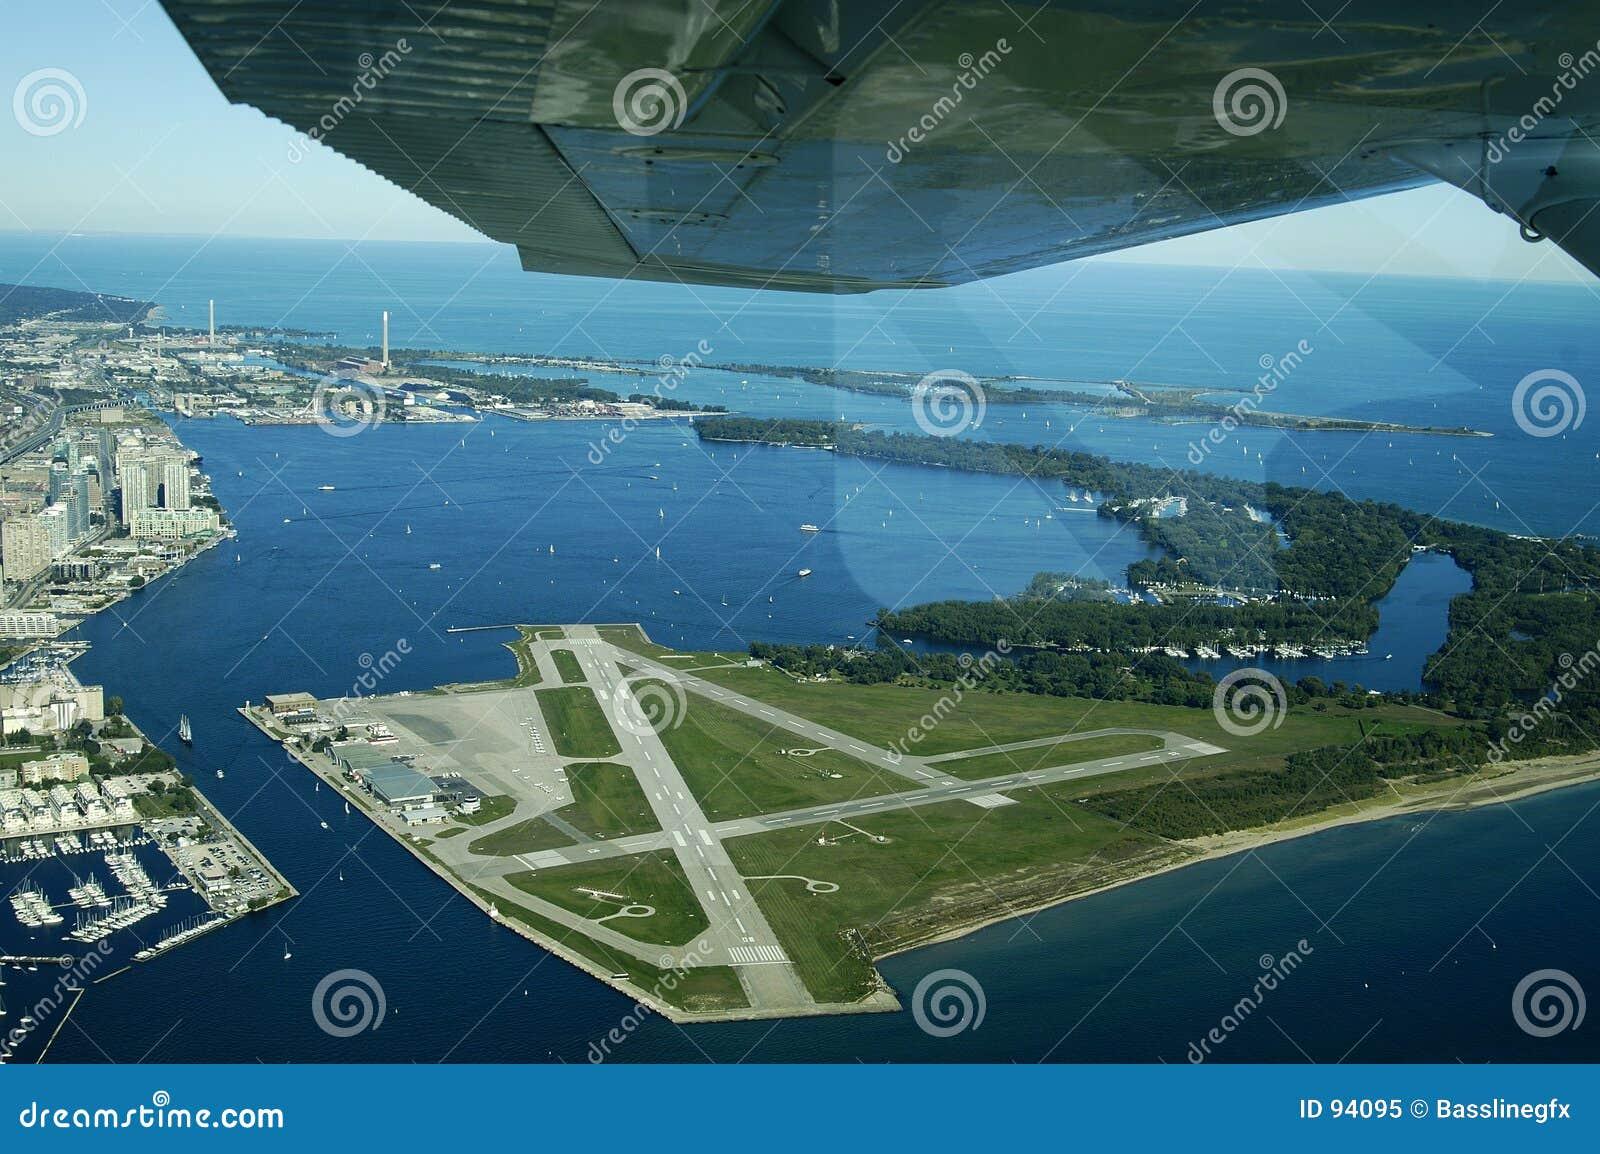 flughafen island